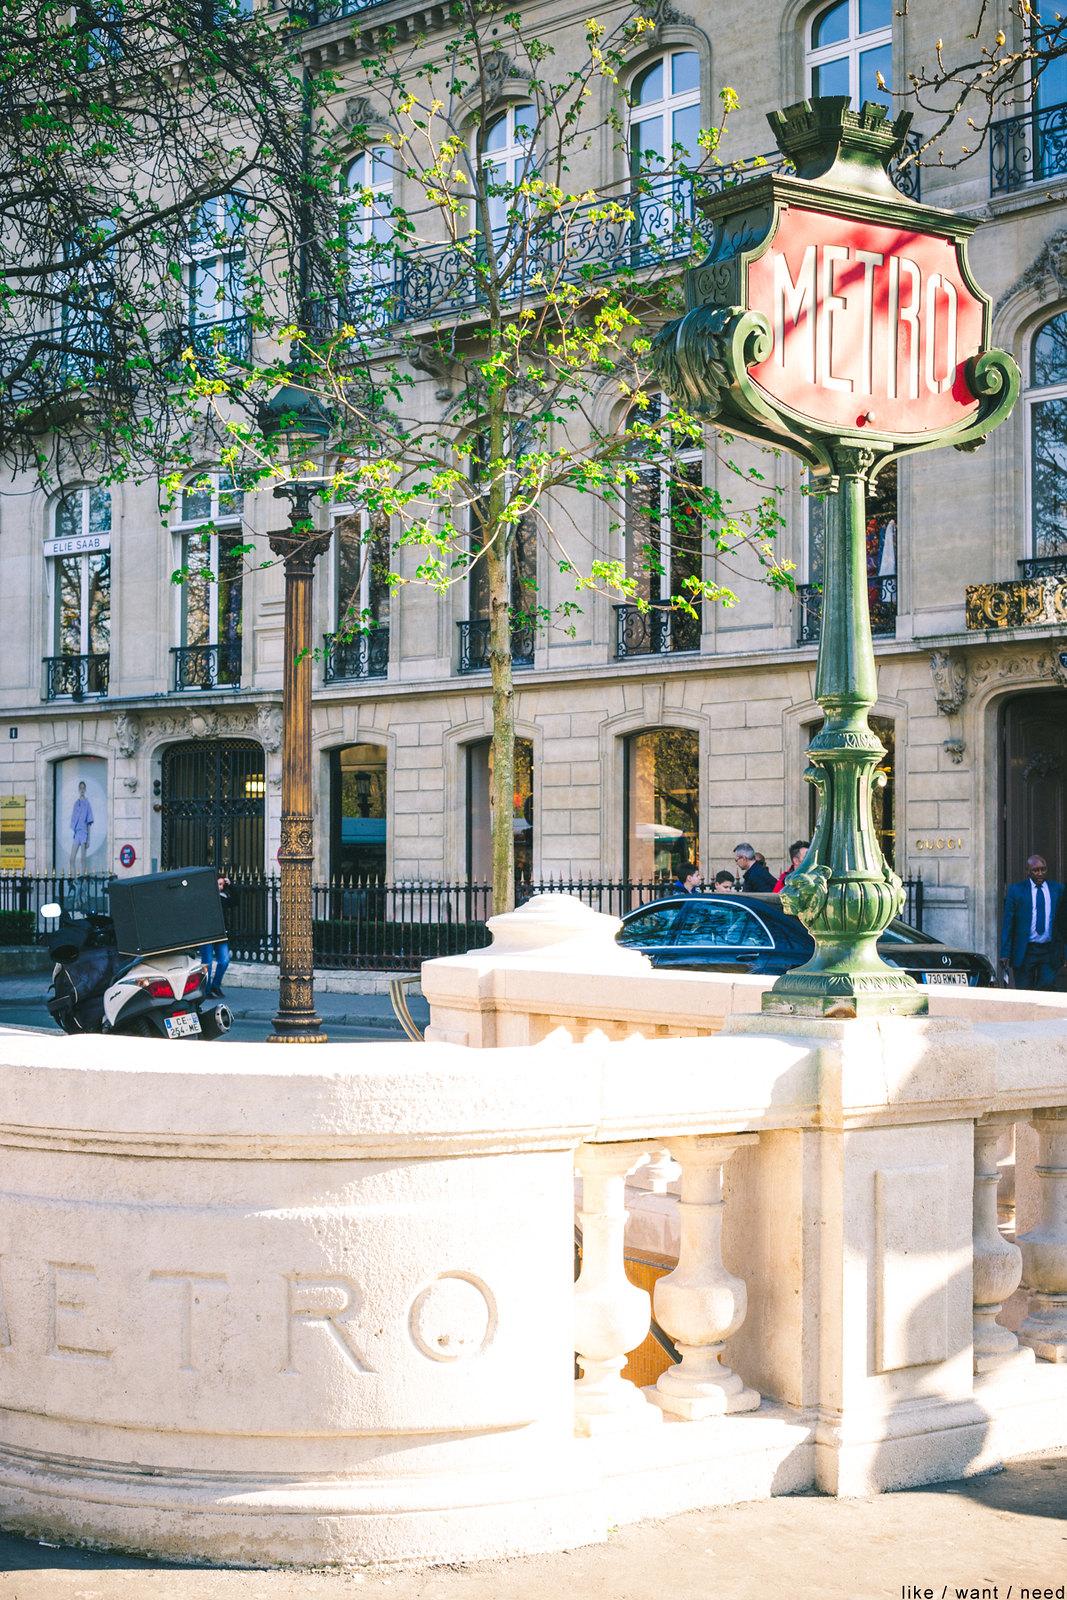 Metro, Avenue Montaigne